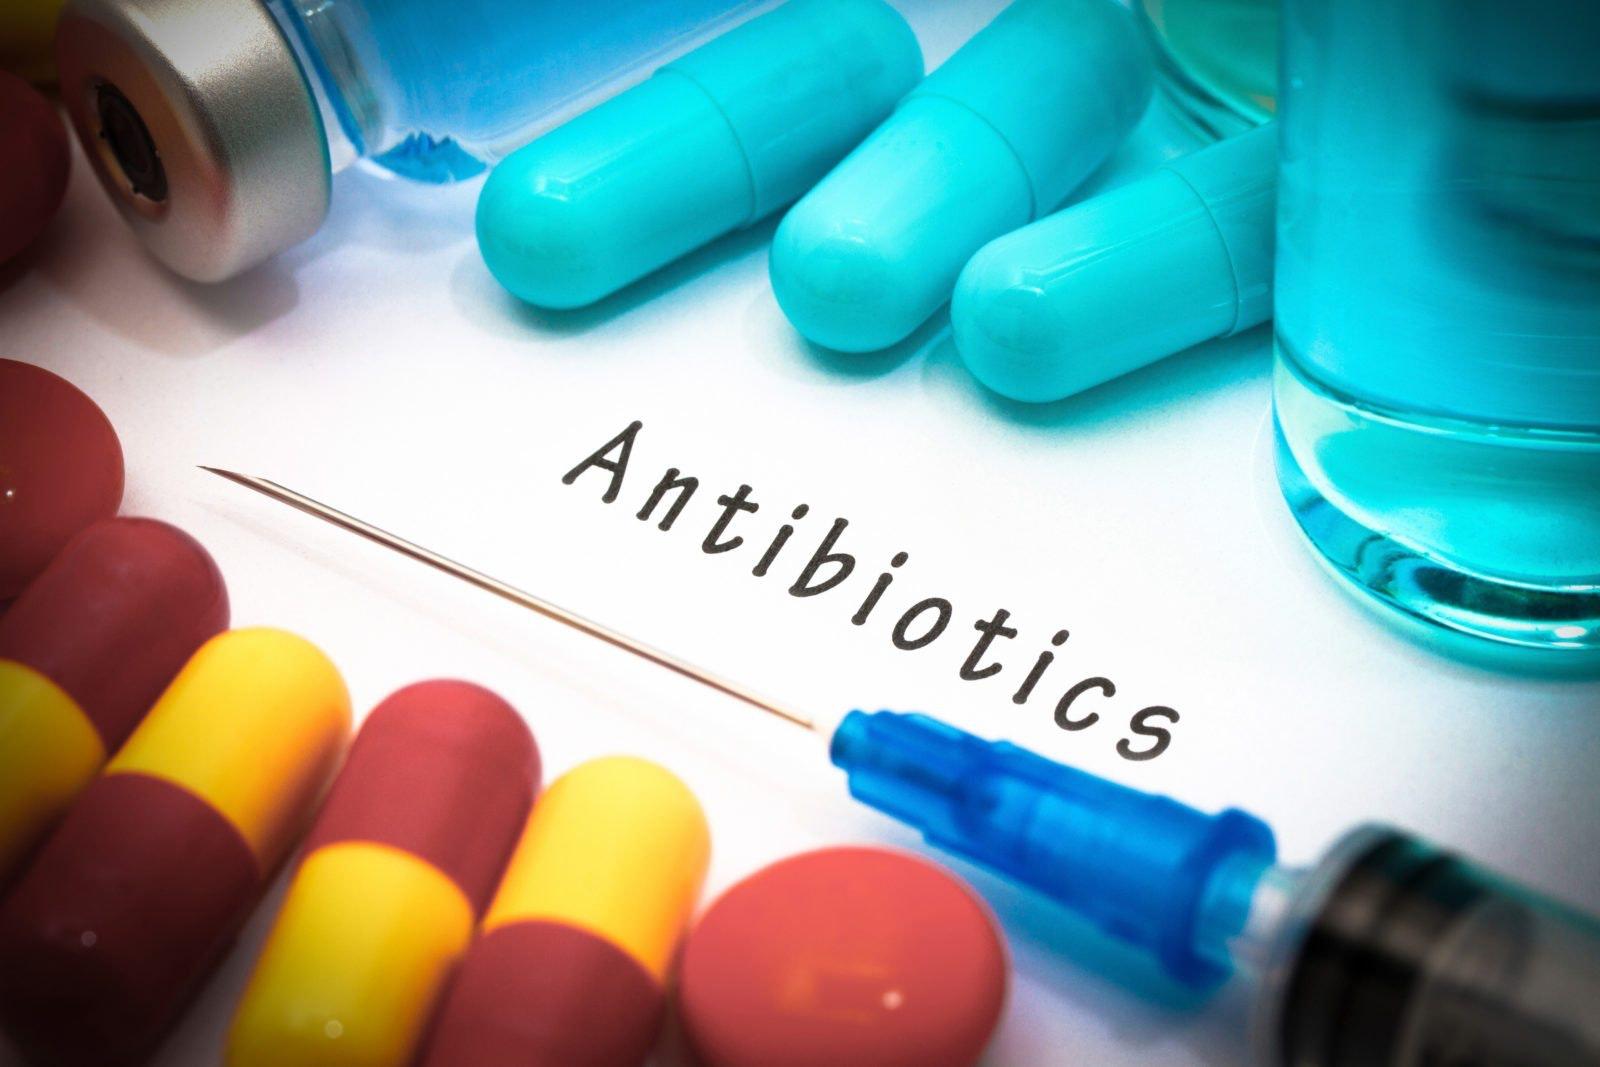 hur länge äter man antibiotika